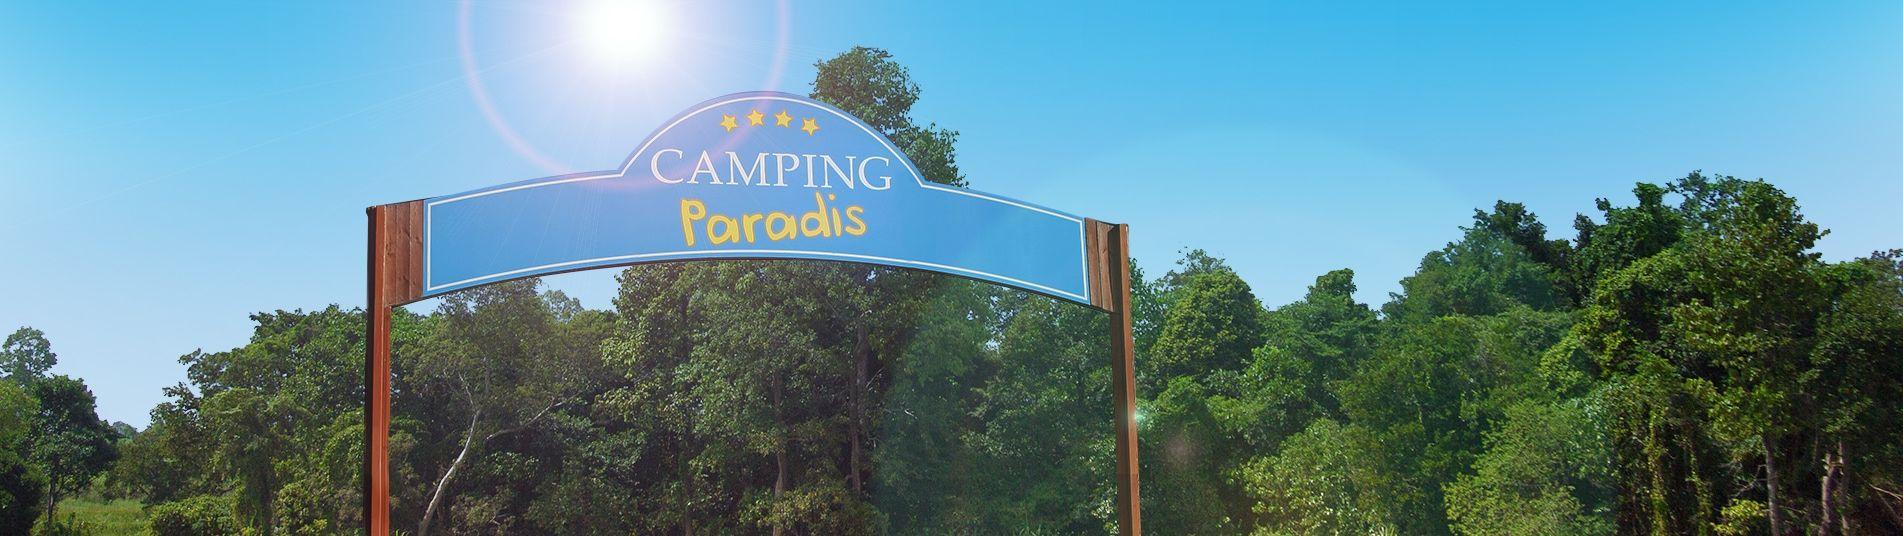 Accueil camping Paradis